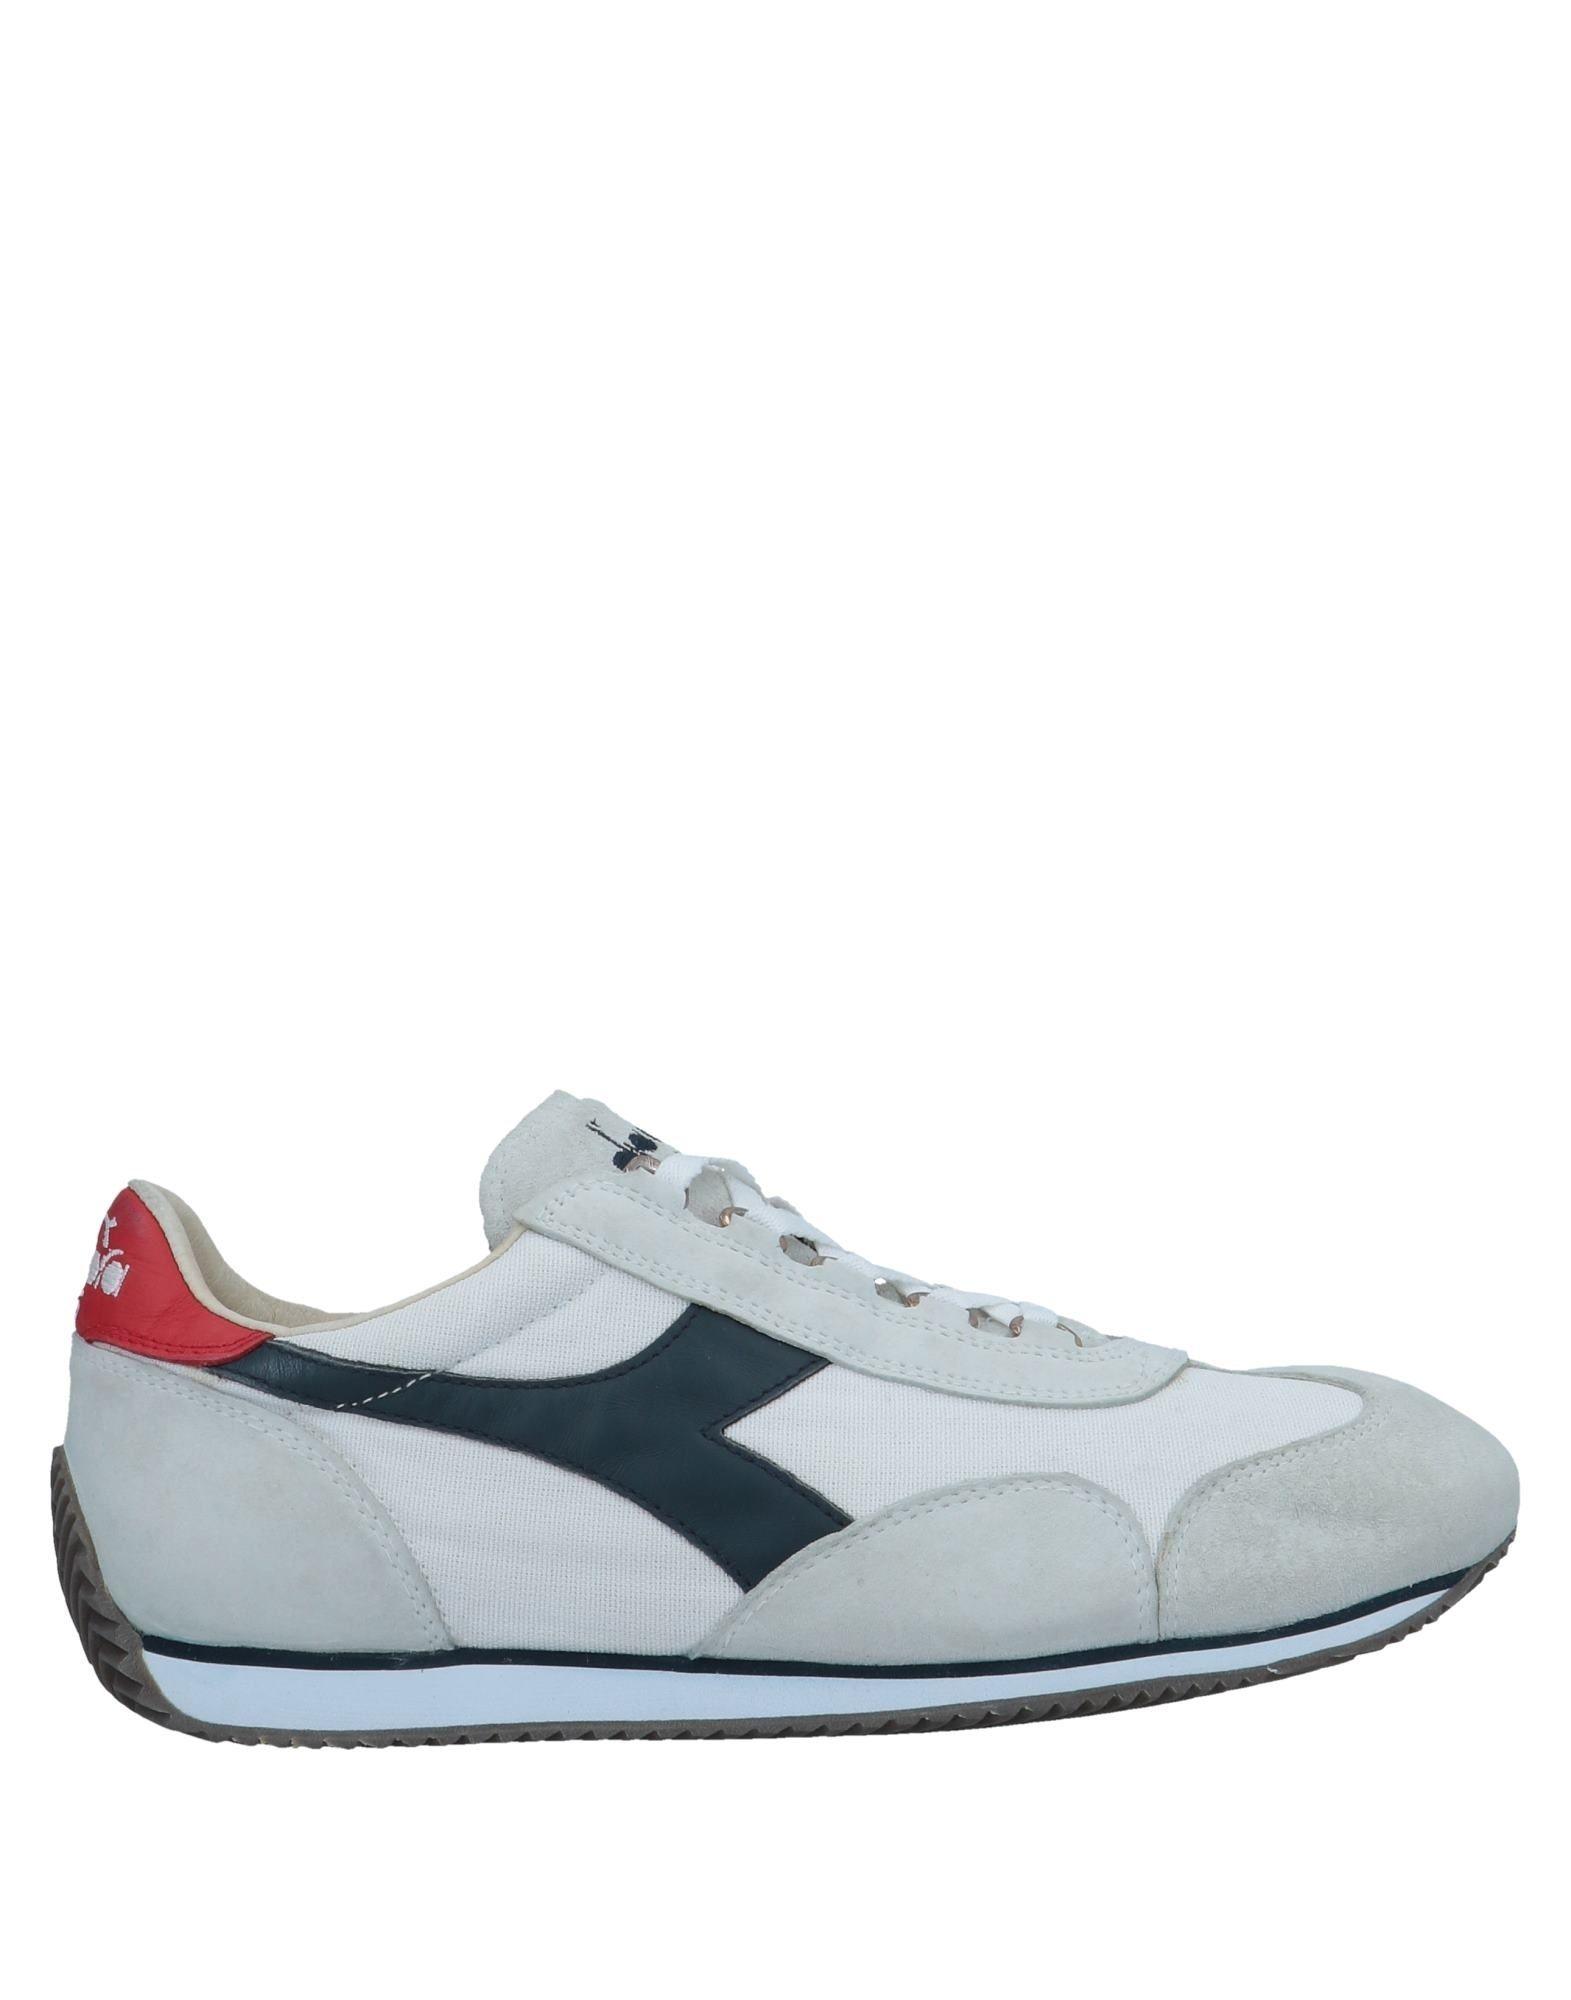 Diadora Heritage uomo  scarpe e piumini Diadora Heritage su YOOX a3ab38320f3